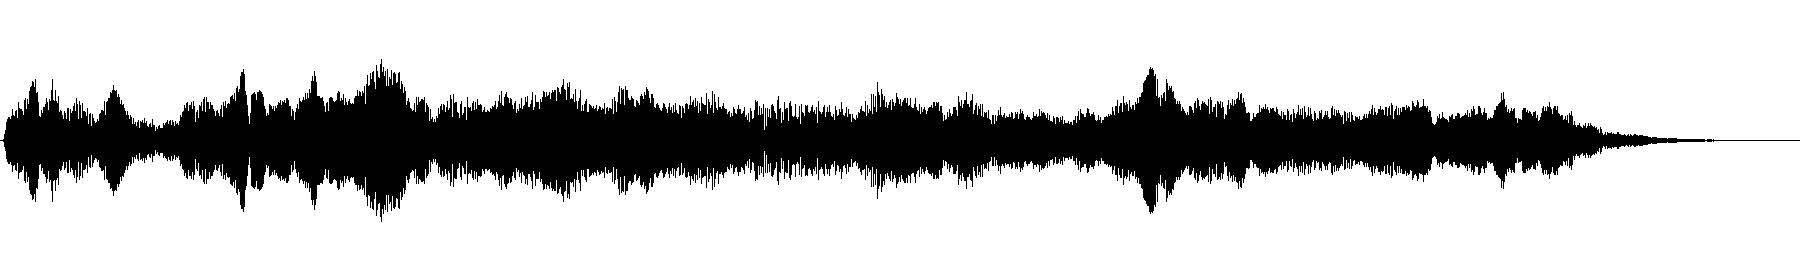 pad61